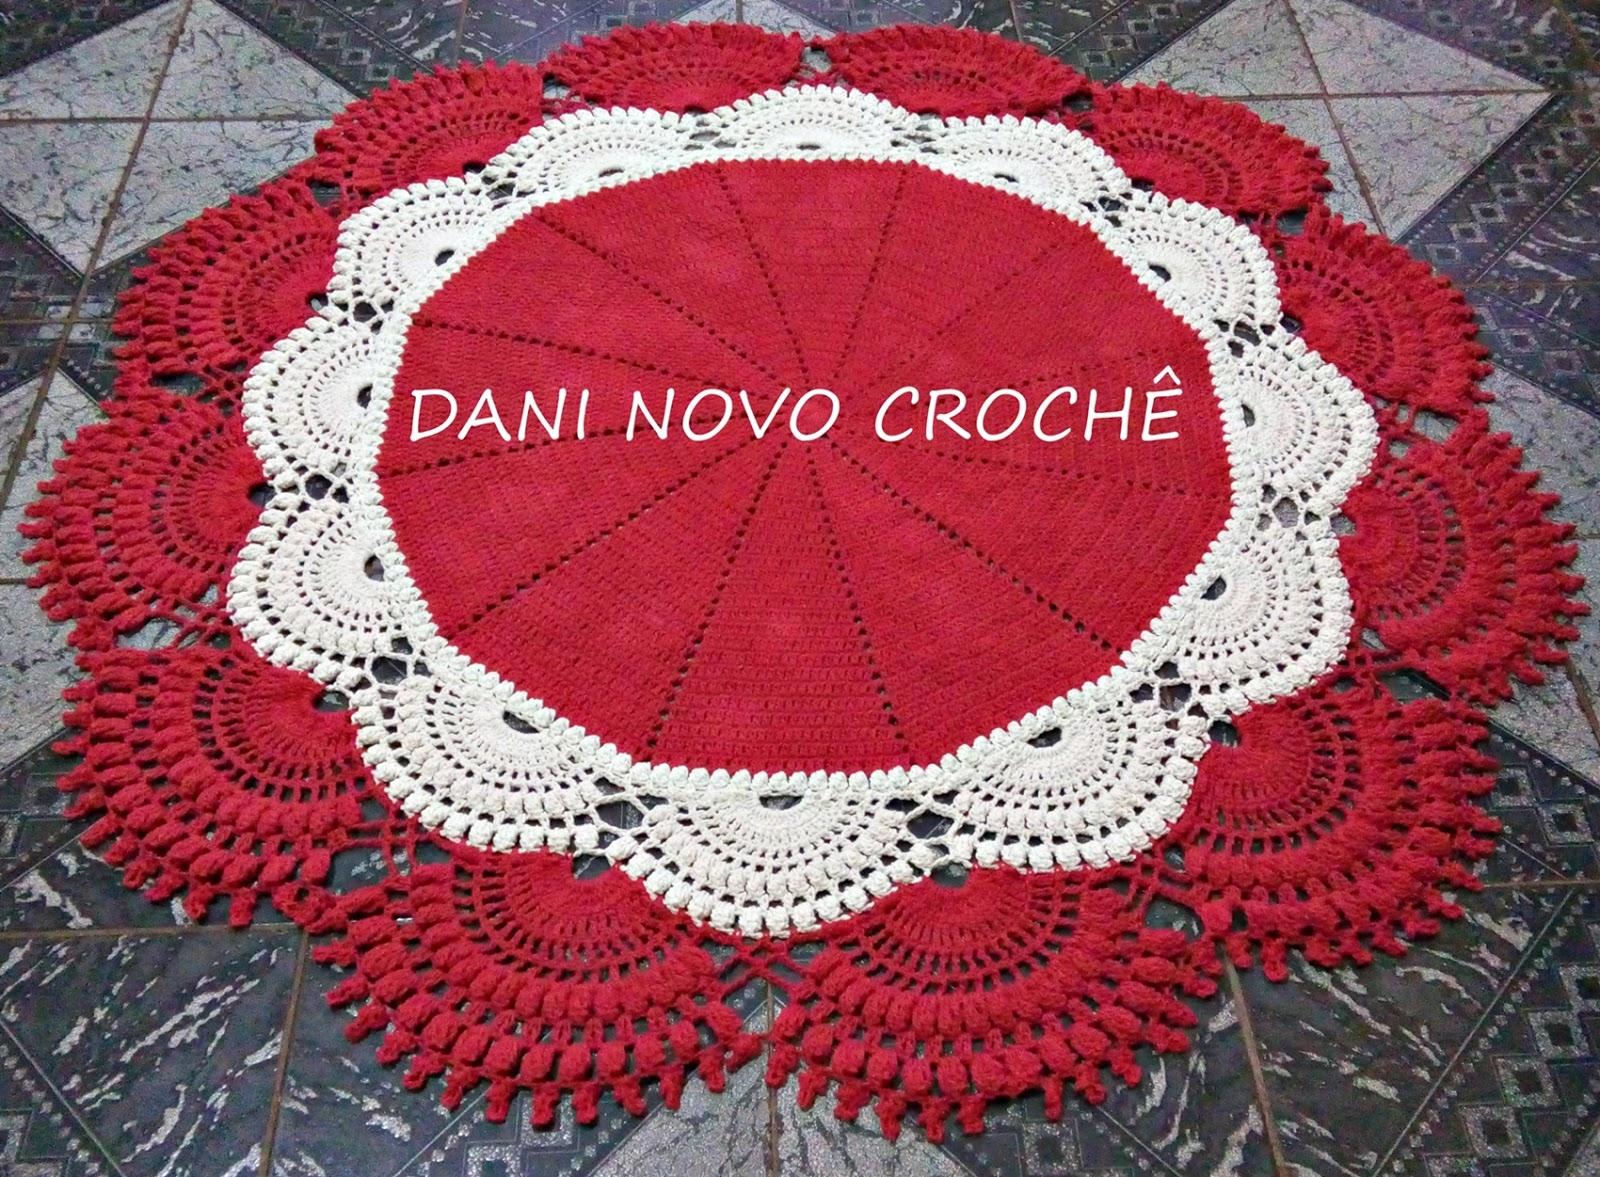 e26efc514b https   www.elo7.com.br tapete-redondo-de-croche-russo dp DC5CF5